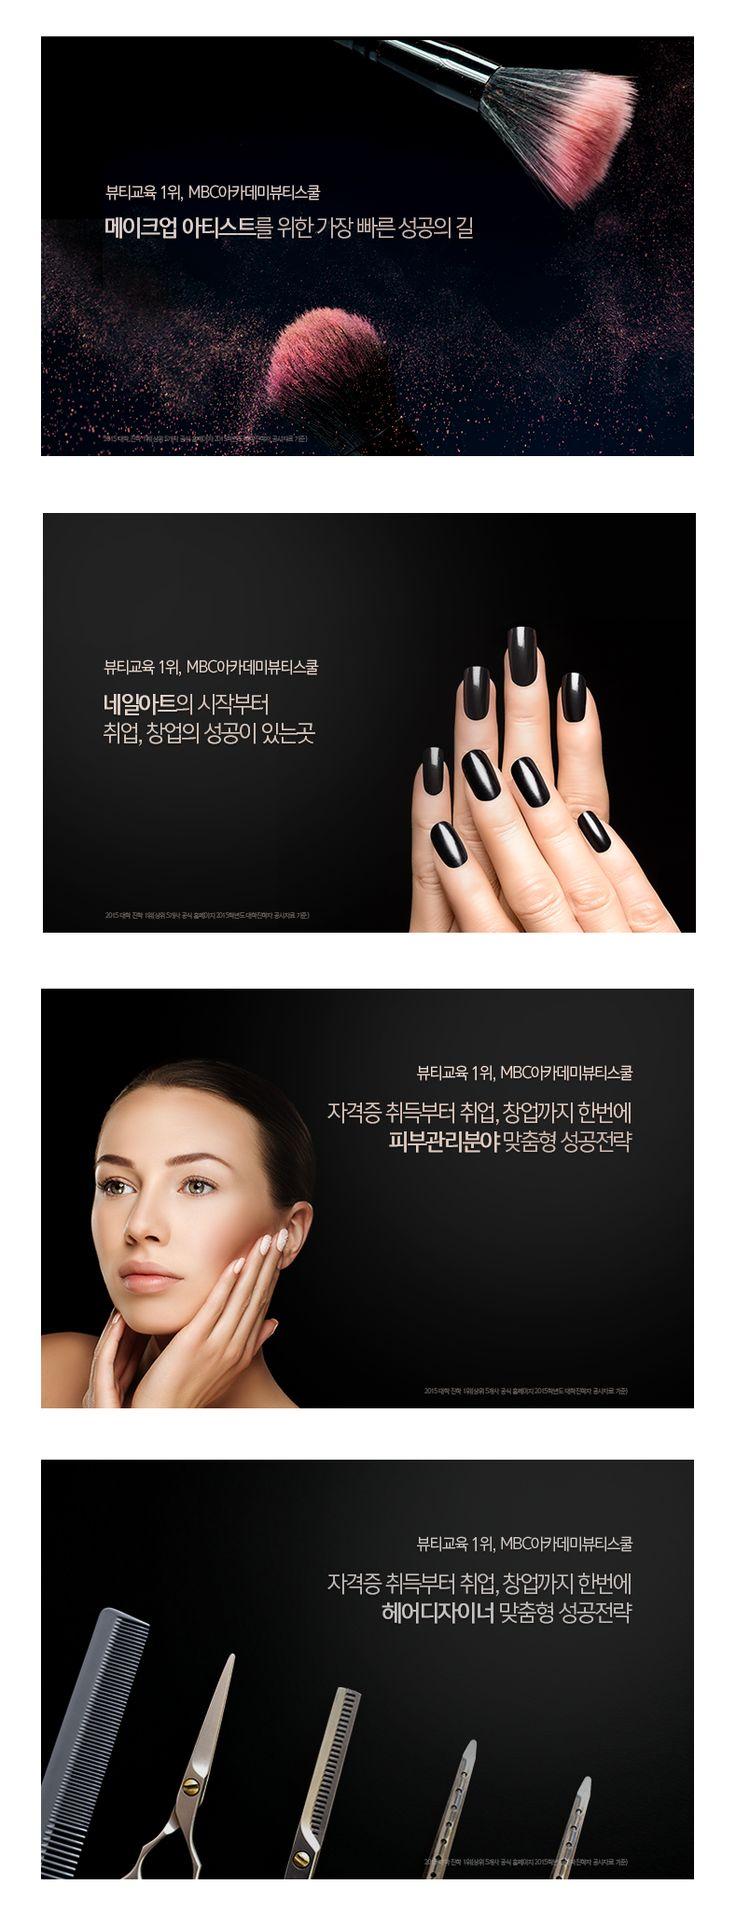 [SNS] Modoo_ Main image ; Beauty Contents Design